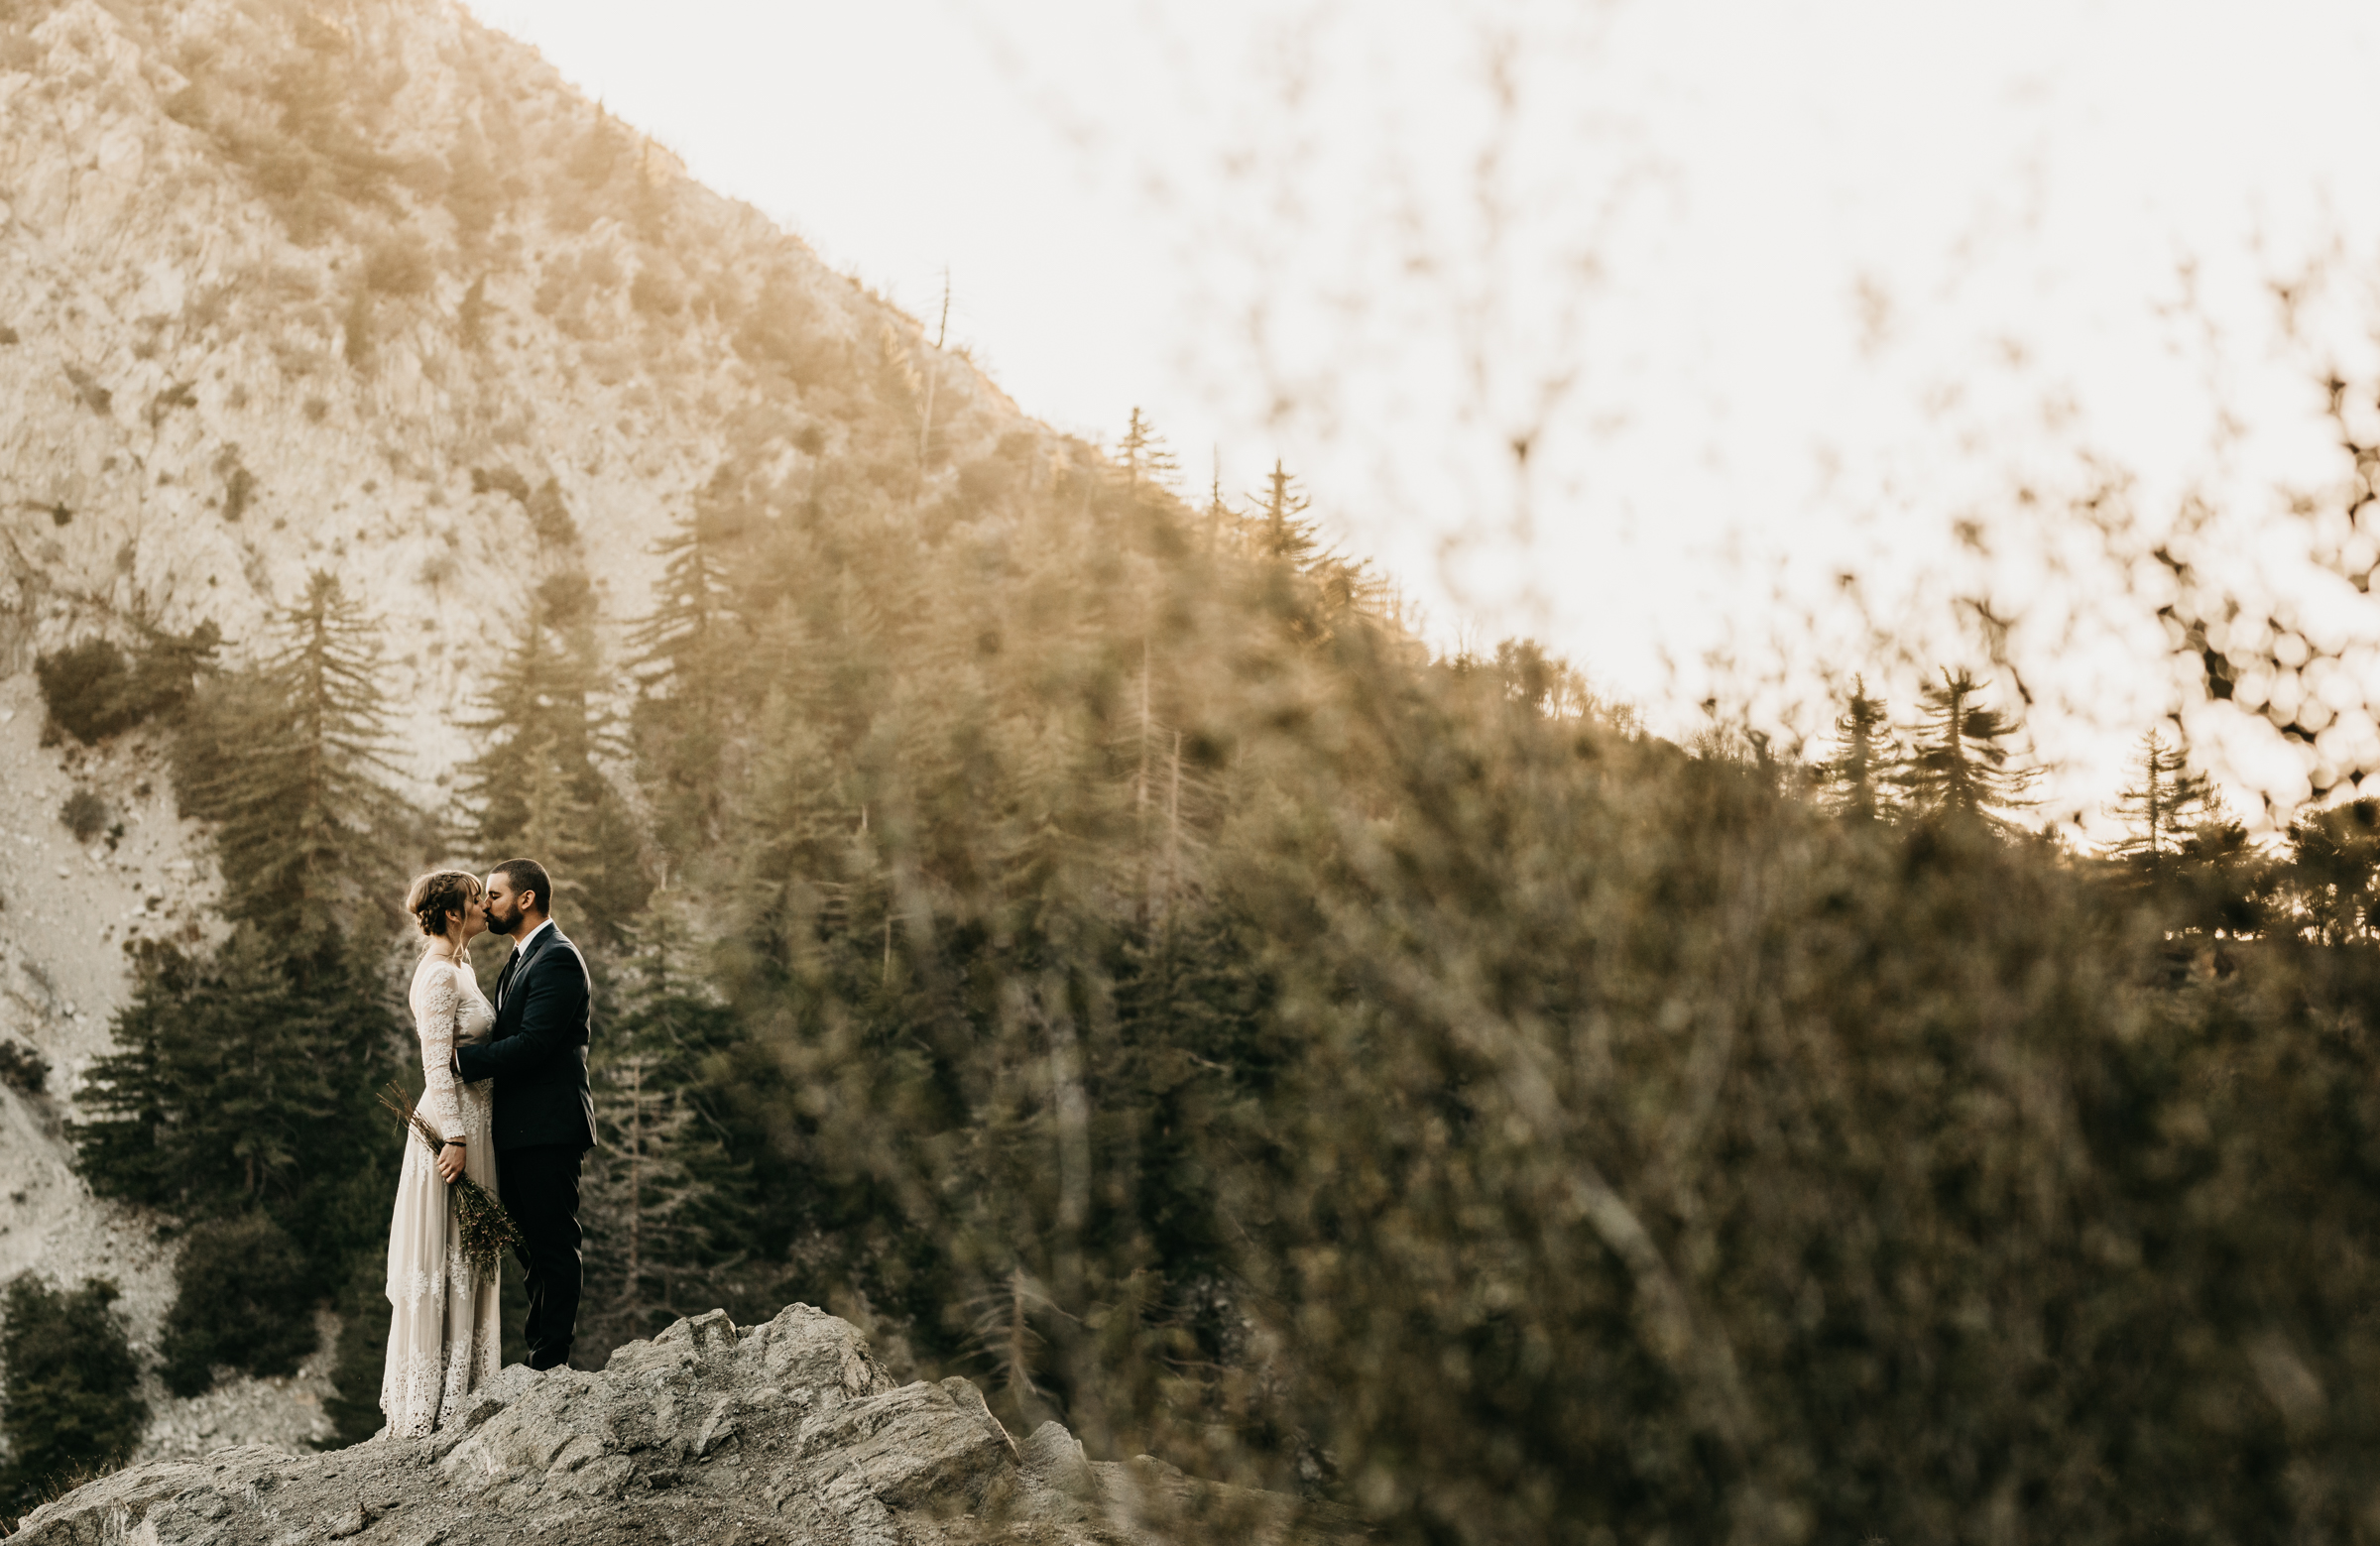 ©Isaiah + Taylor Photography - Los Angeles Wedding Photographers - Los Angeles Forest Wedding -69.jpg